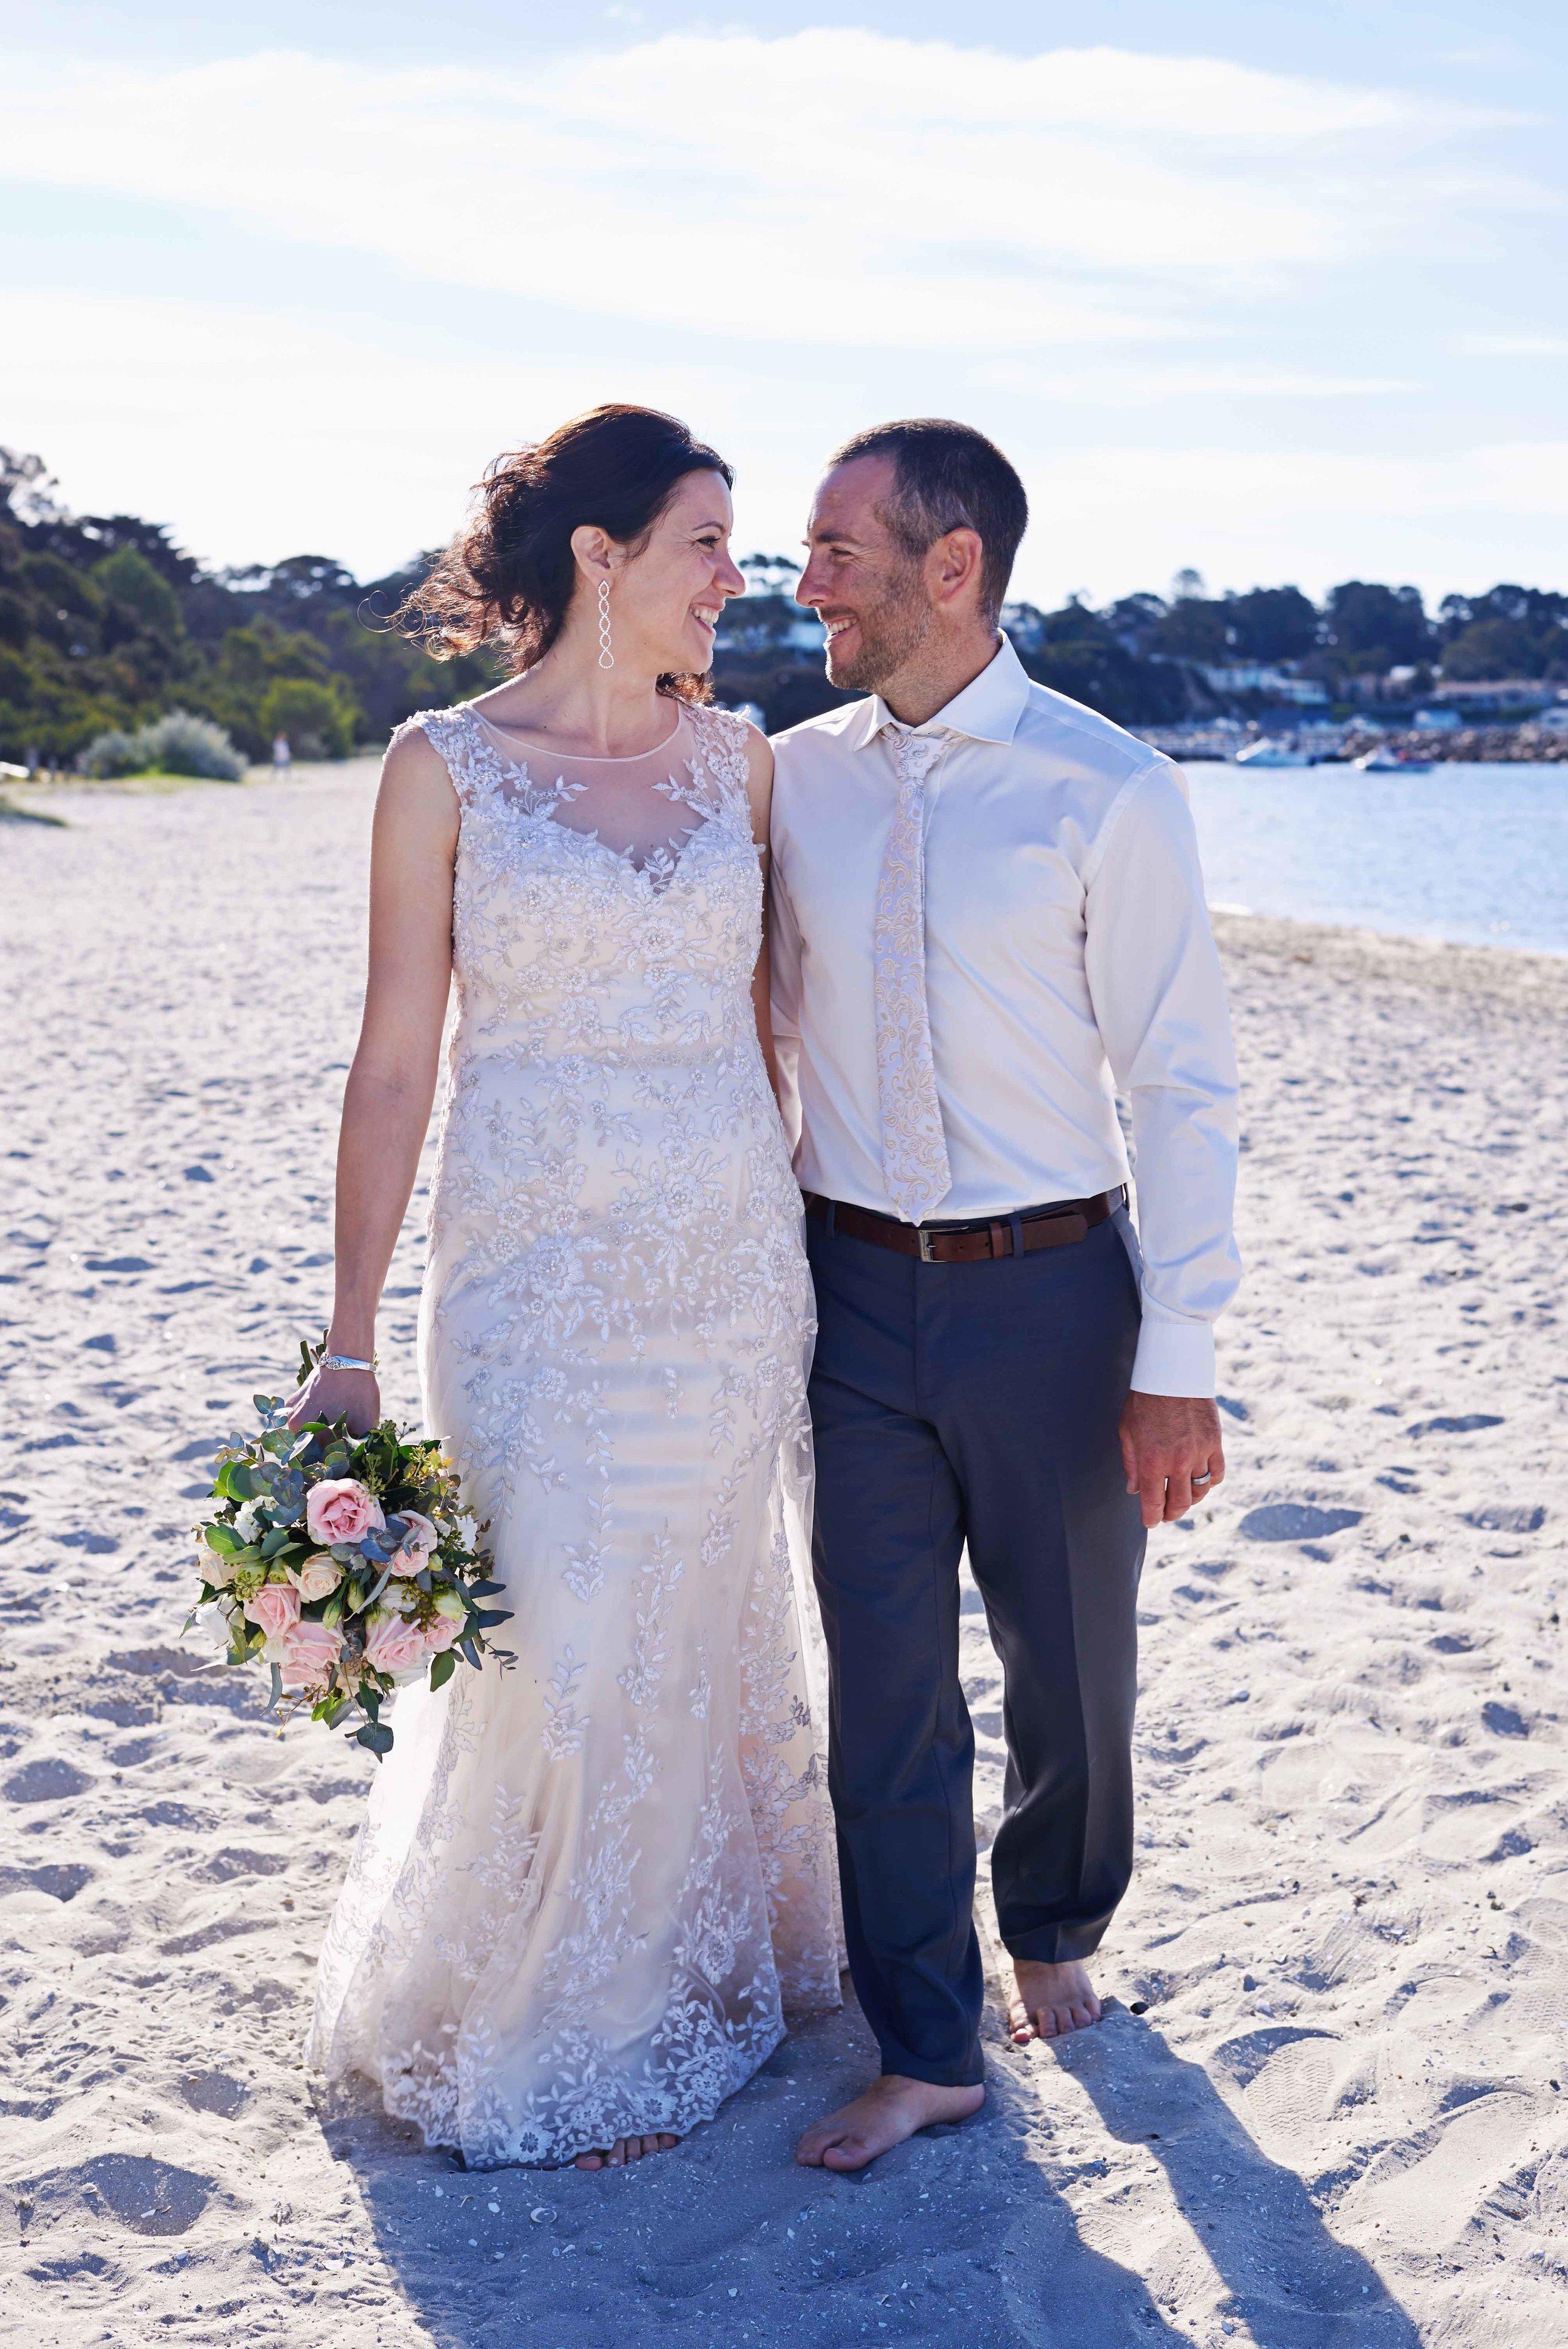 sorrento-wedding-photography-all-smiles-marissa-jade-photography-162.jpg